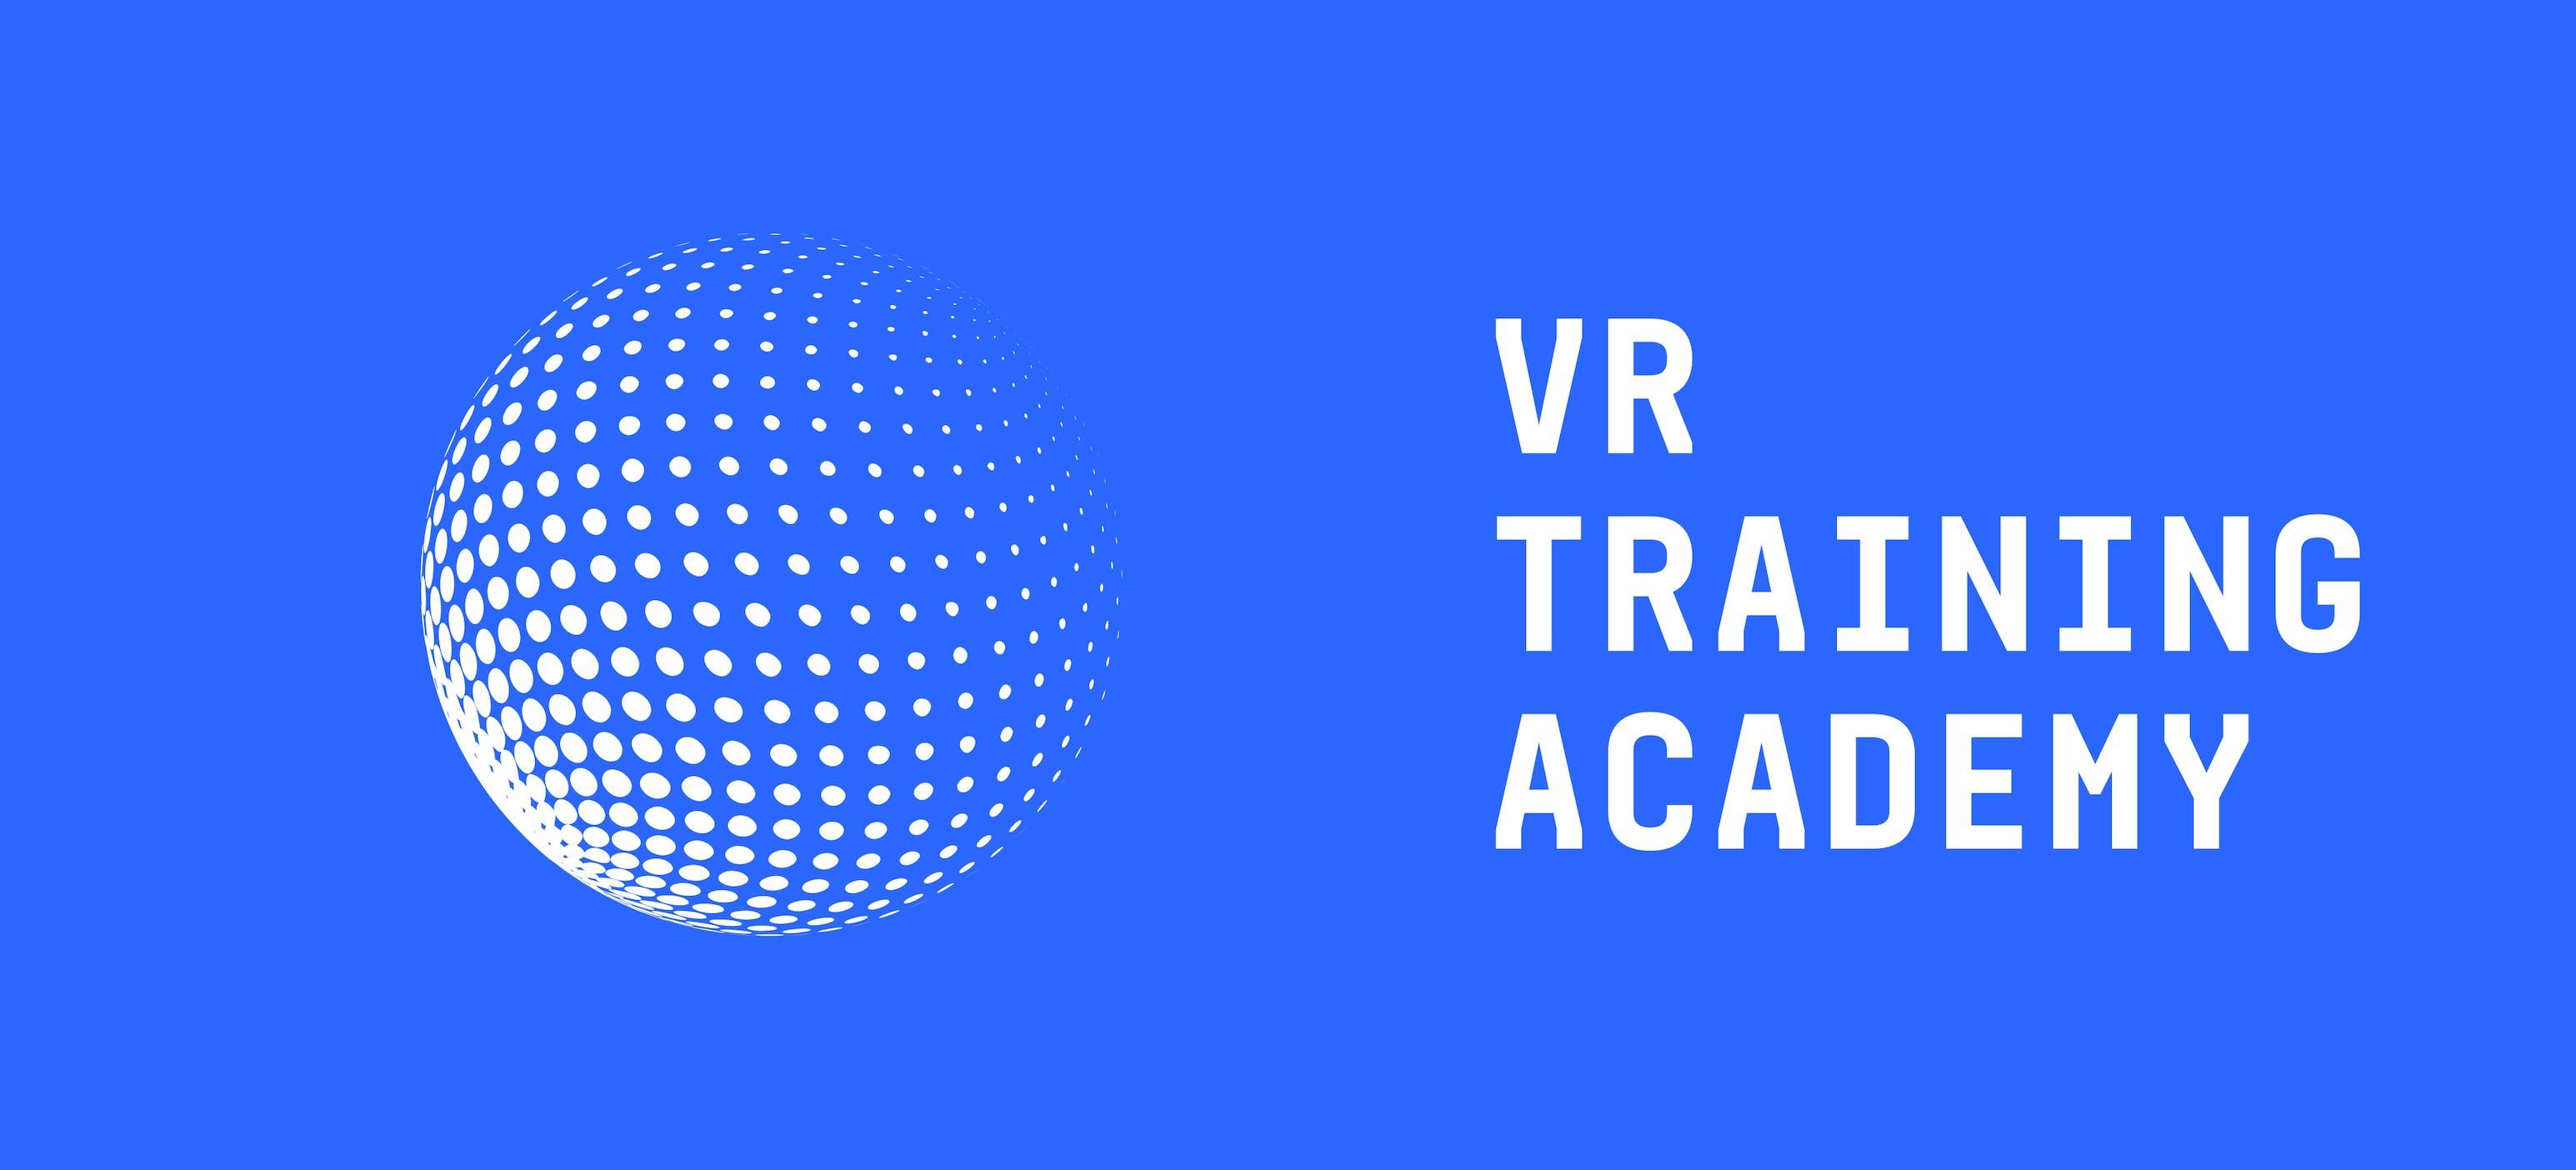 VR Training Academy Thumbnail